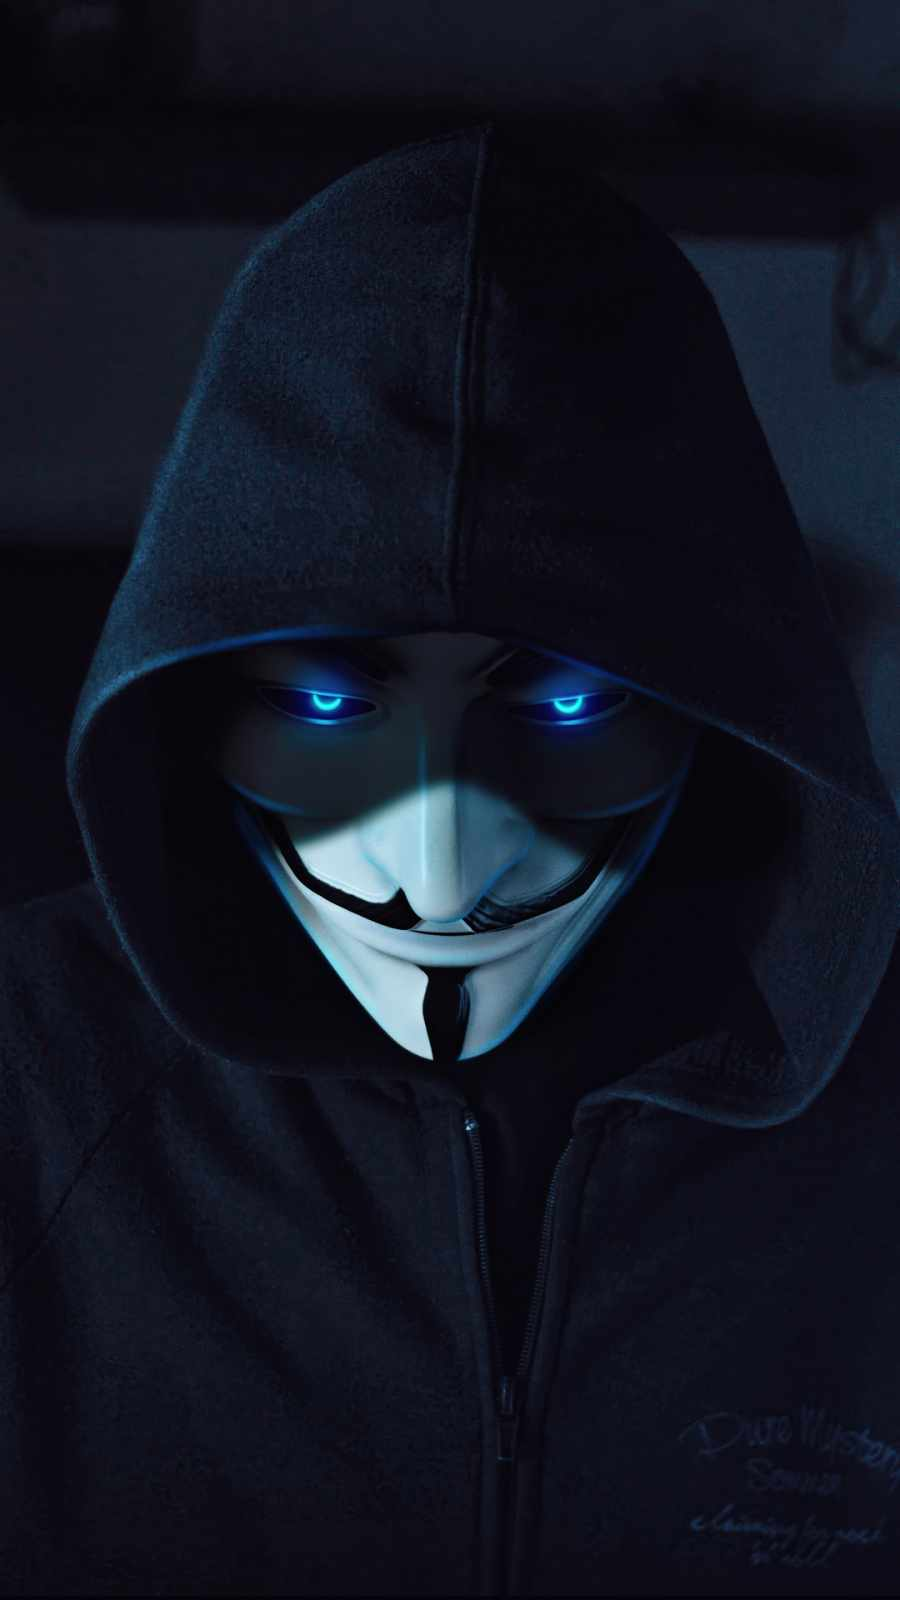 Anonymus guy blue eyes